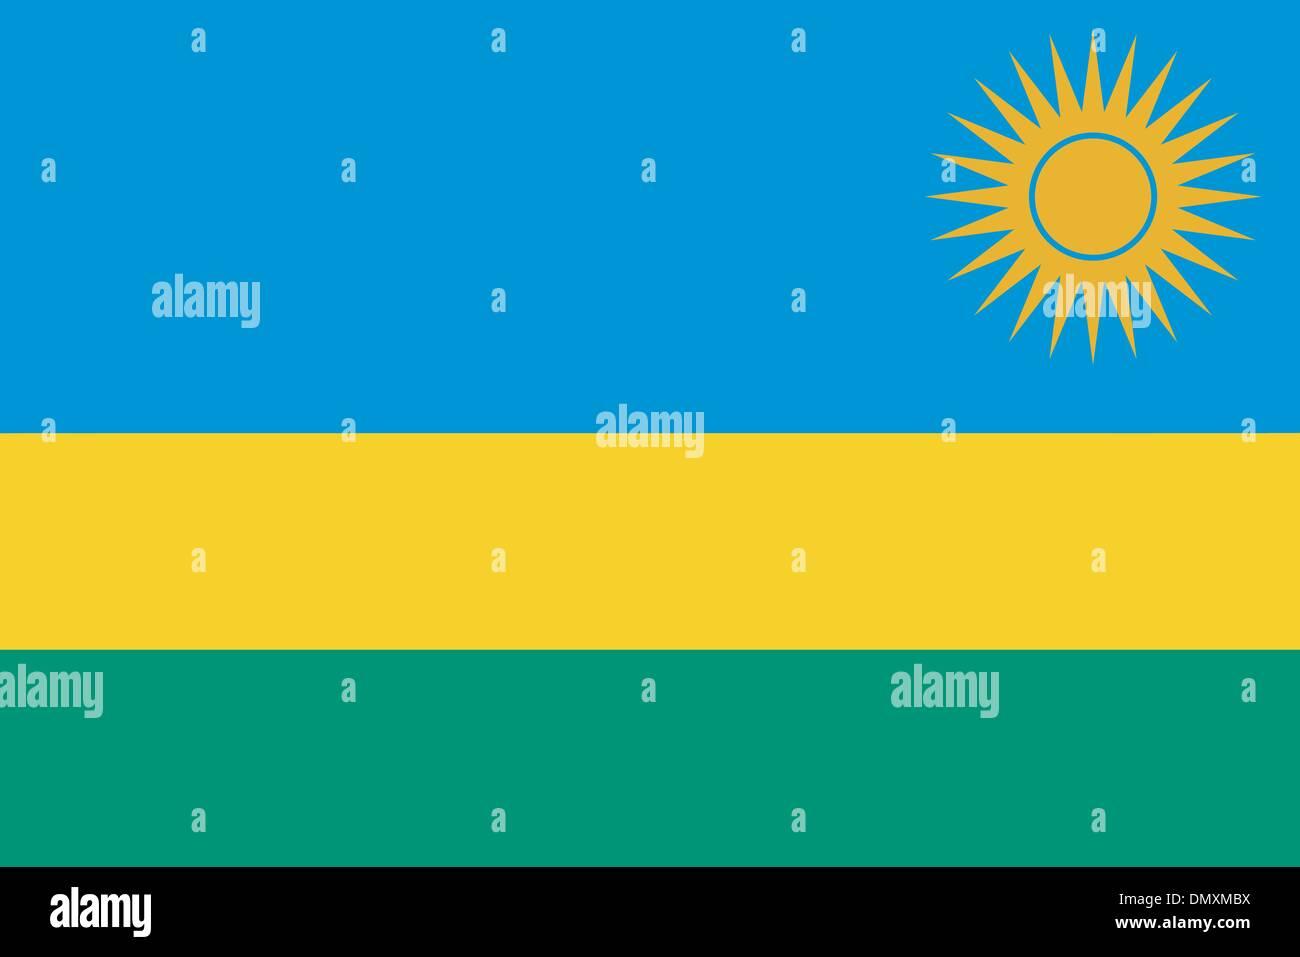 Vector illustration of the flag of Rwanda - Stock Vector